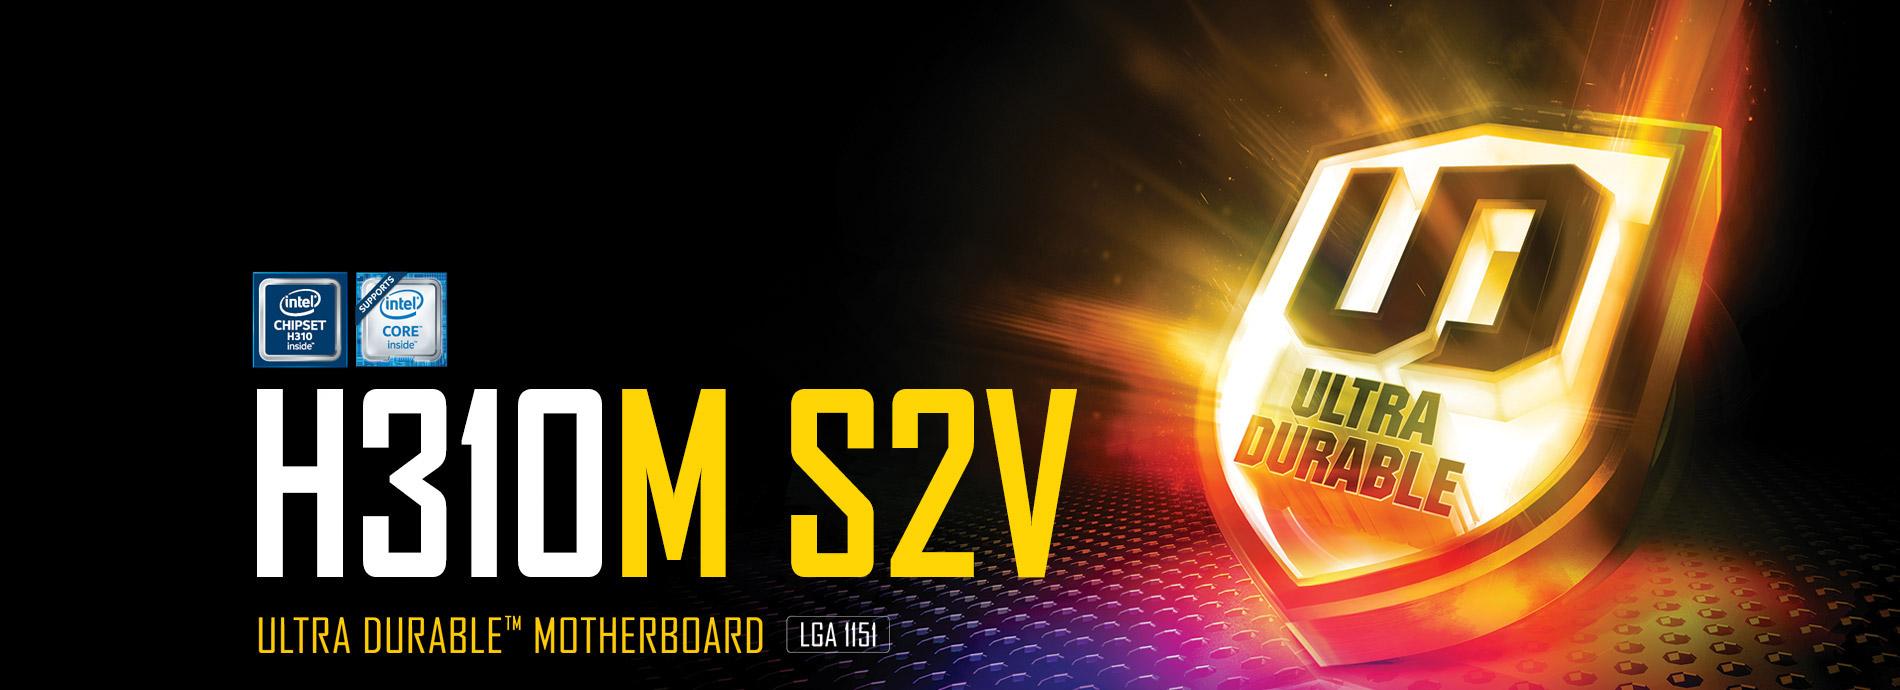 H310M S2V (rev  1 0)   Motherboard - GIGABYTE Global